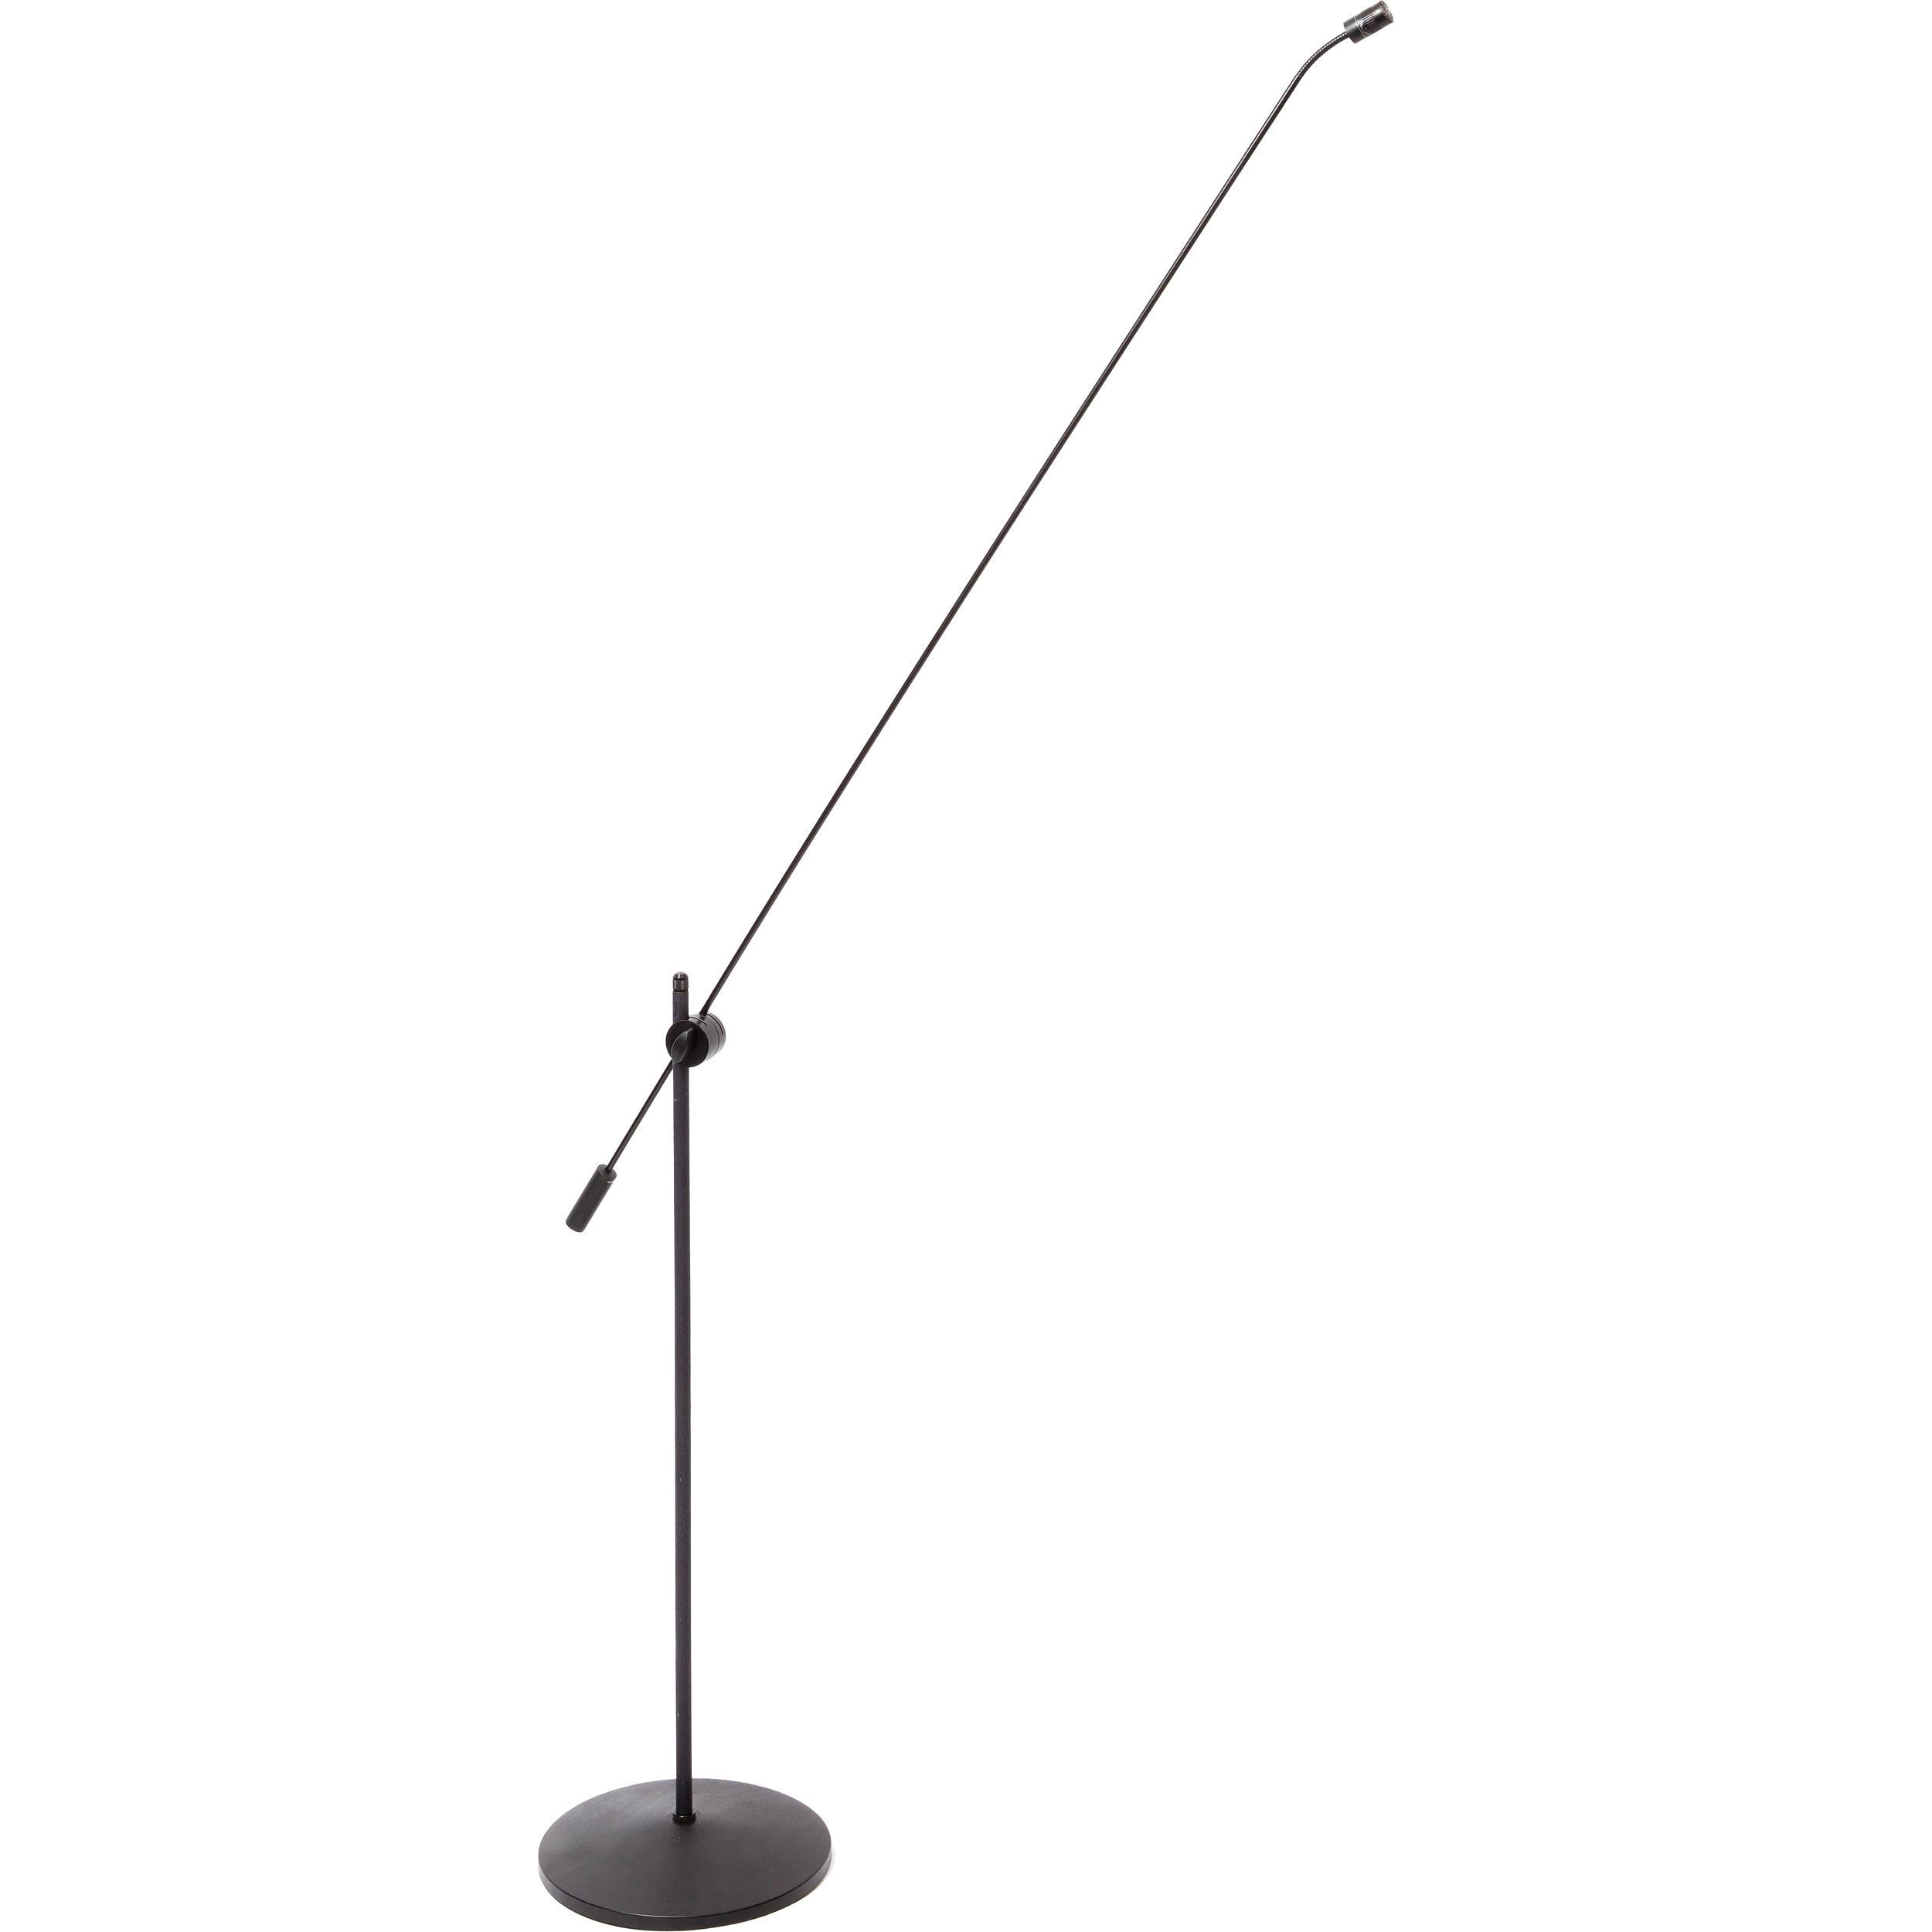 Dpa Microphones Supercardioid Microphone B H